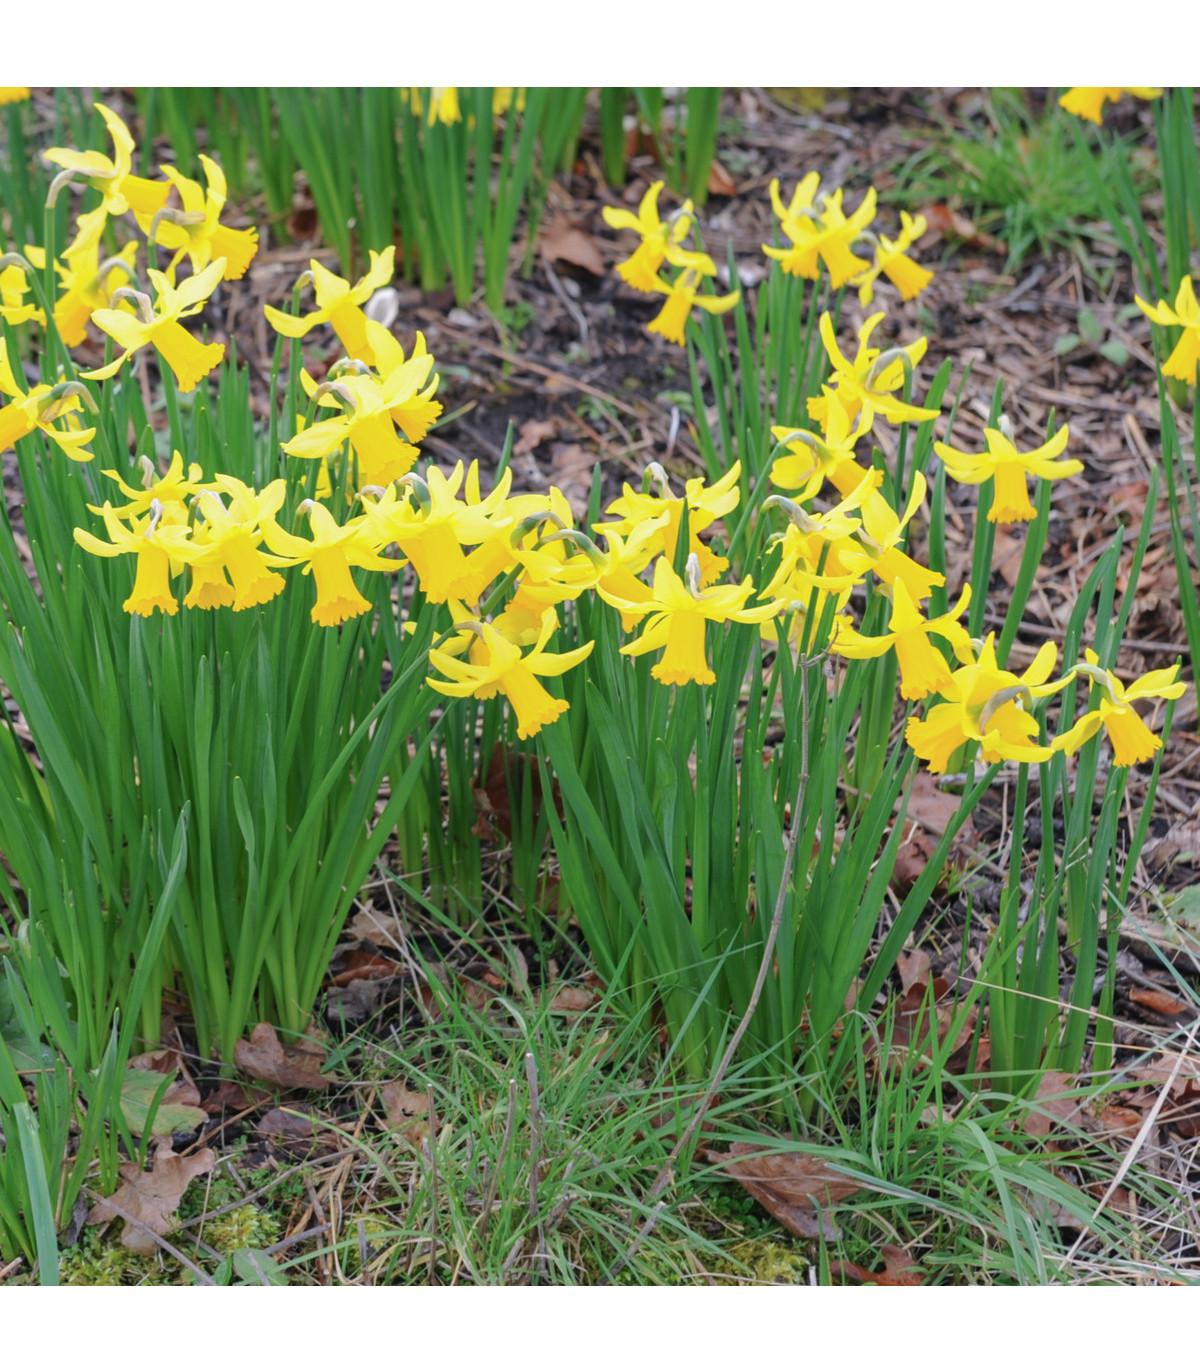 Narcis February gold - Narcissus - cibule narcisů - 3 ks